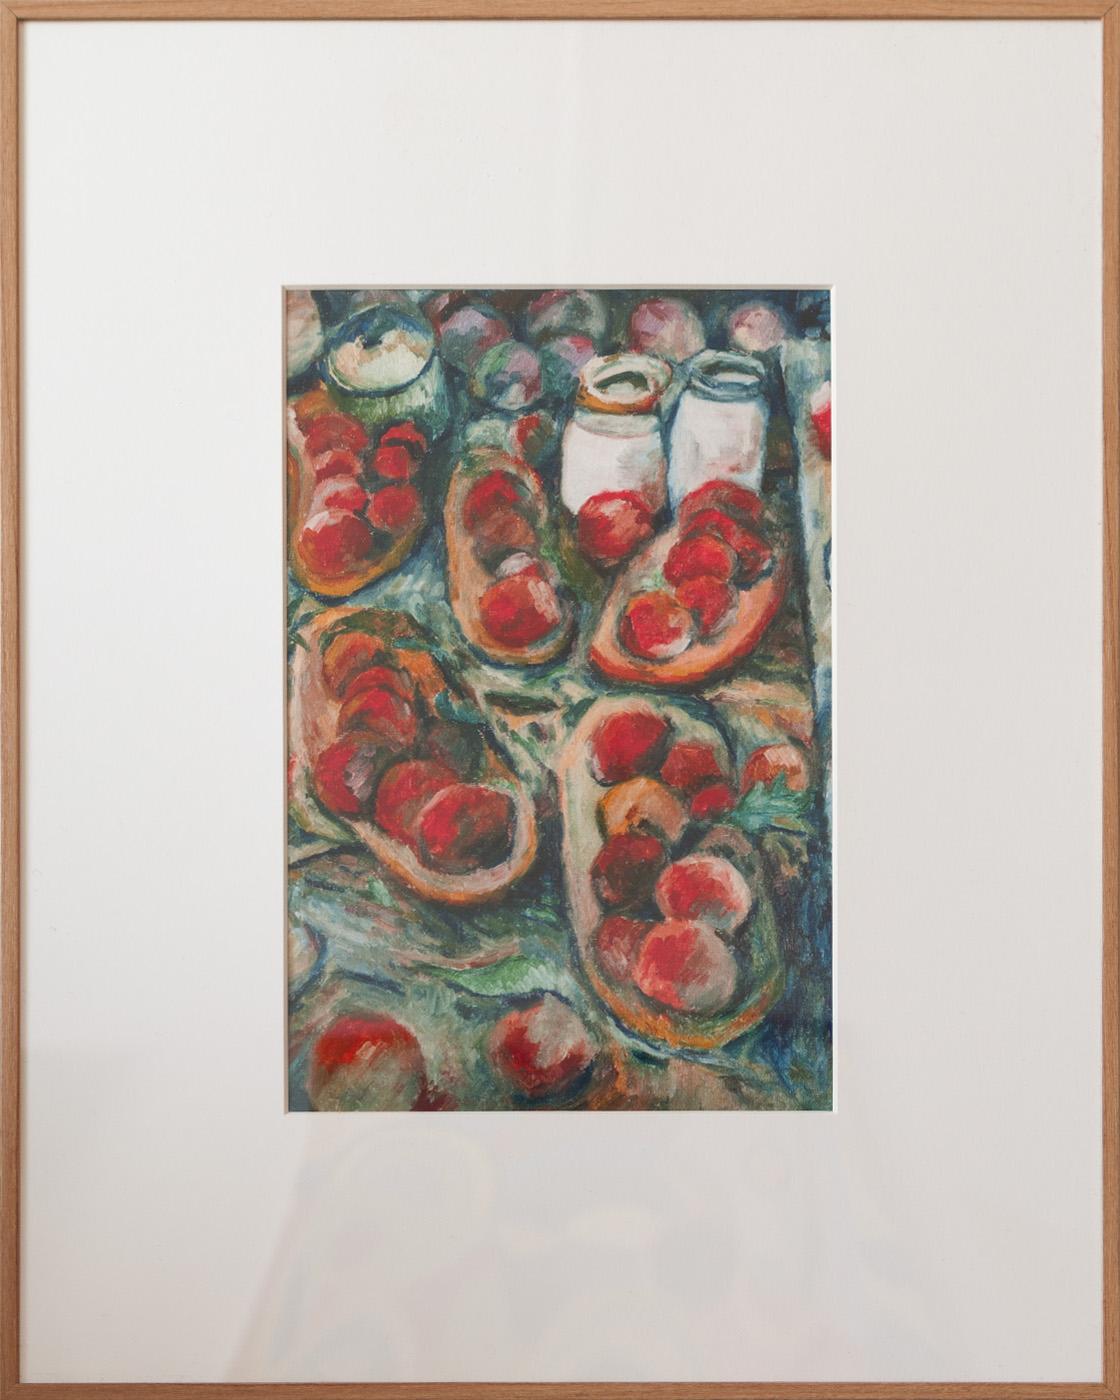 Still Life with Fruit Dish and Apples. 有水果盘和苹果的静物[Digital reproduction 数码再版]